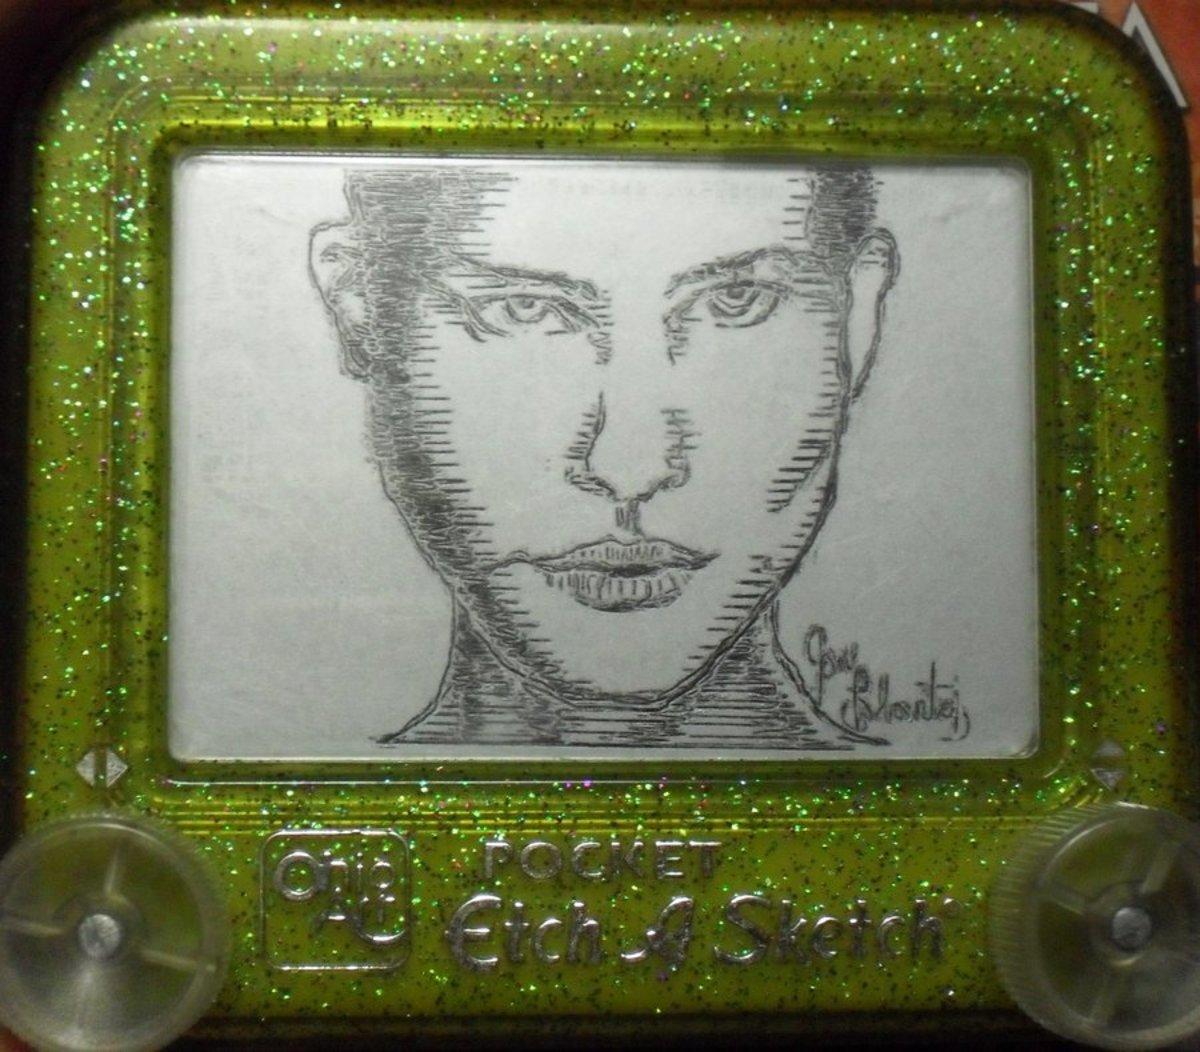 http://pikajane.deviantart.com/art/Natalie-Portman-V-For-Vendetta-191313289